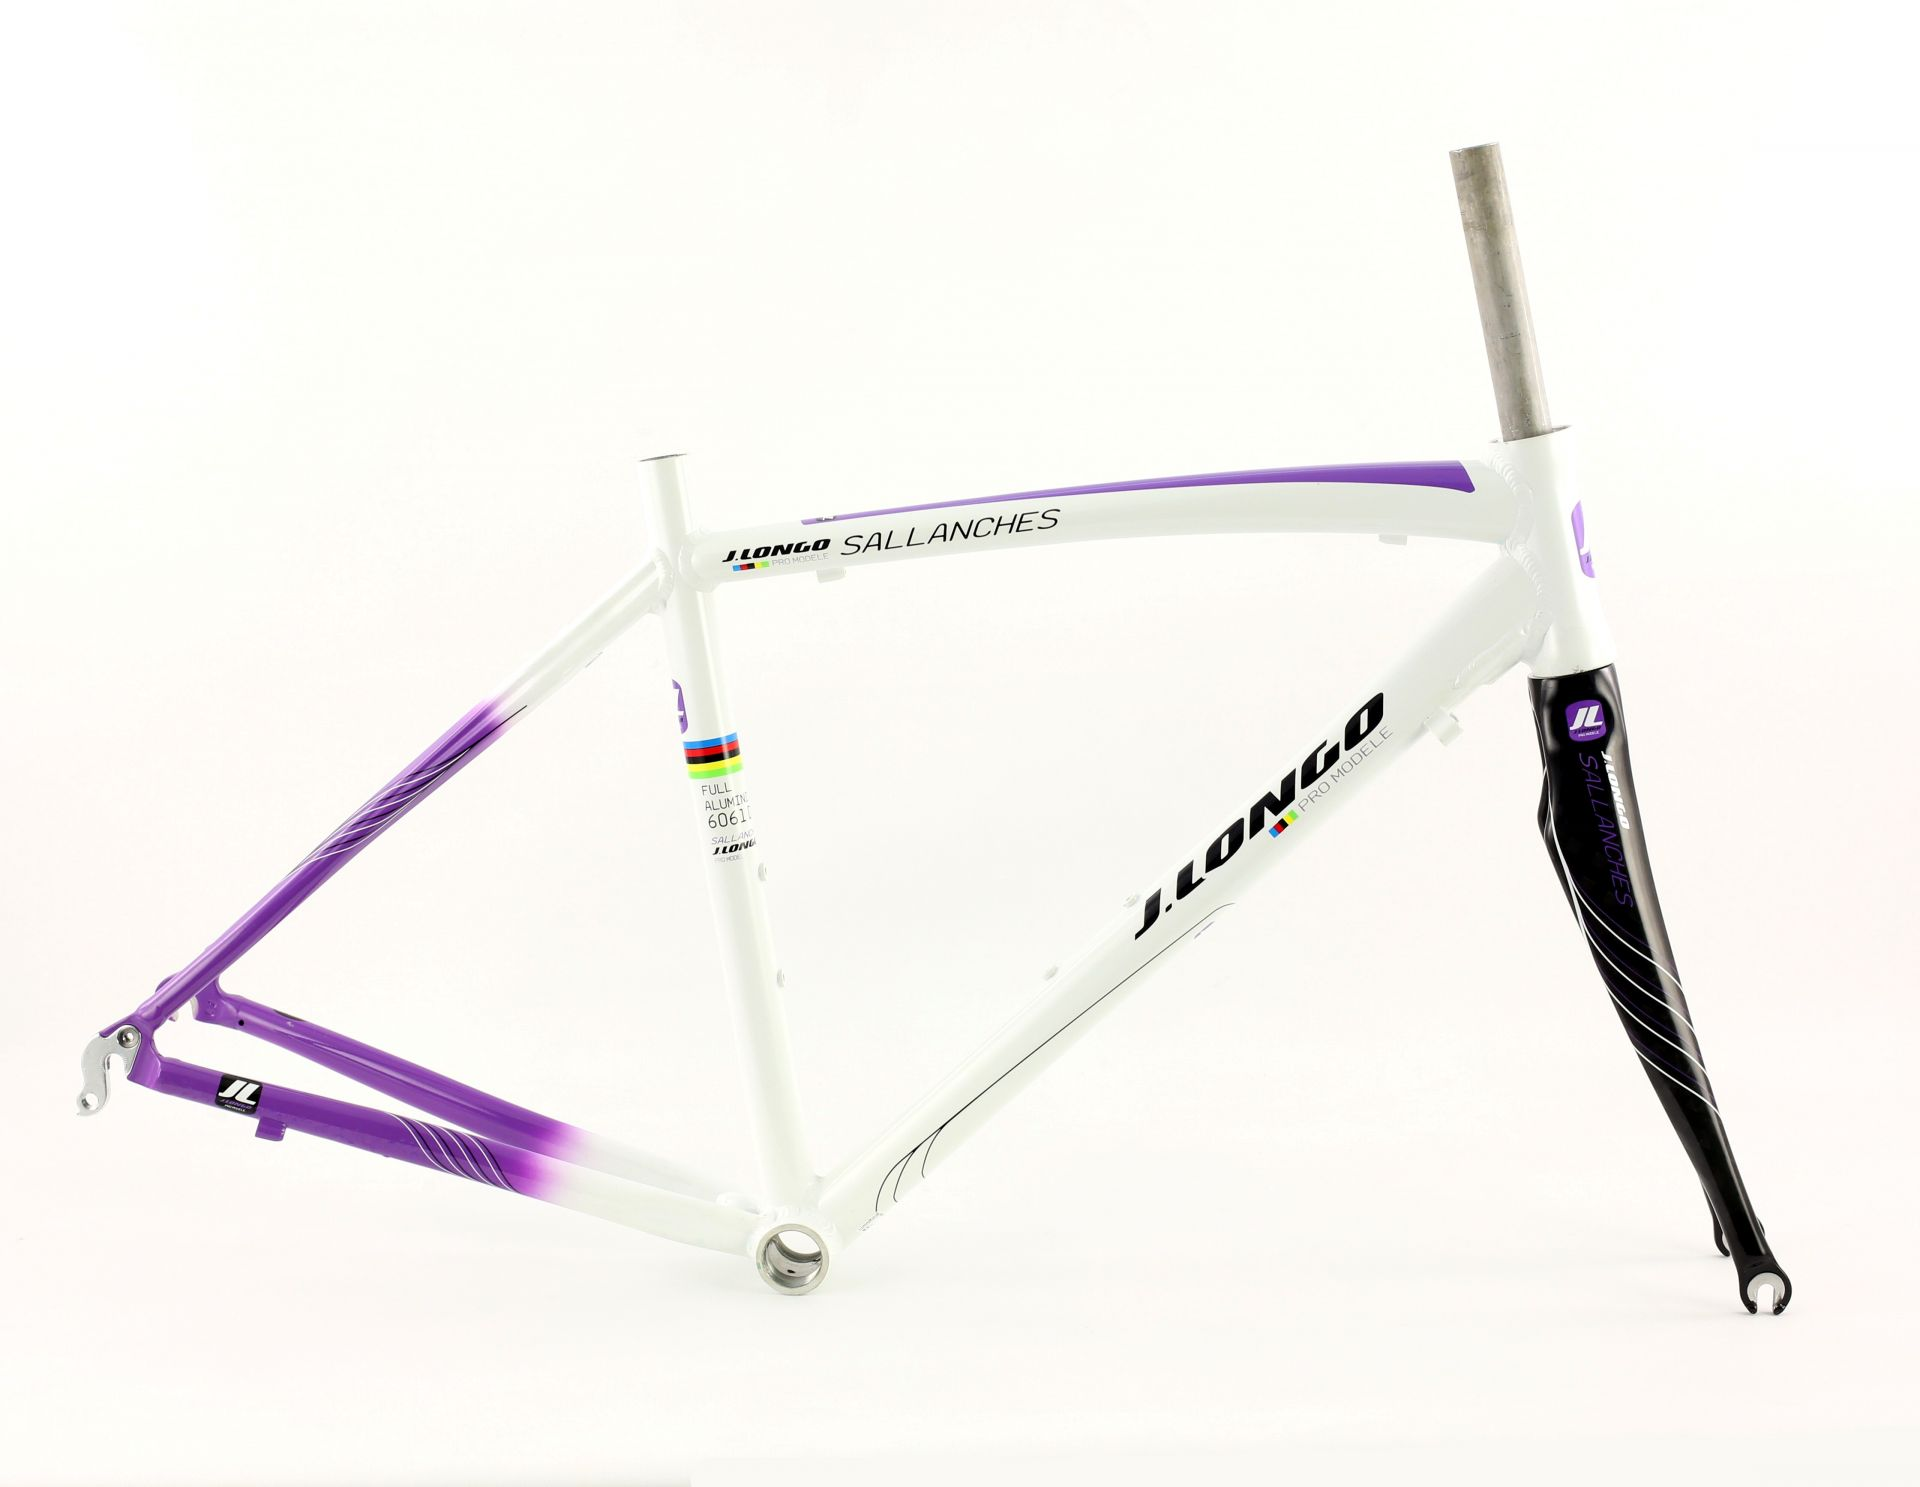 Cadre vélo fitness J.Longo Sallanches alu + fourche carbone - M